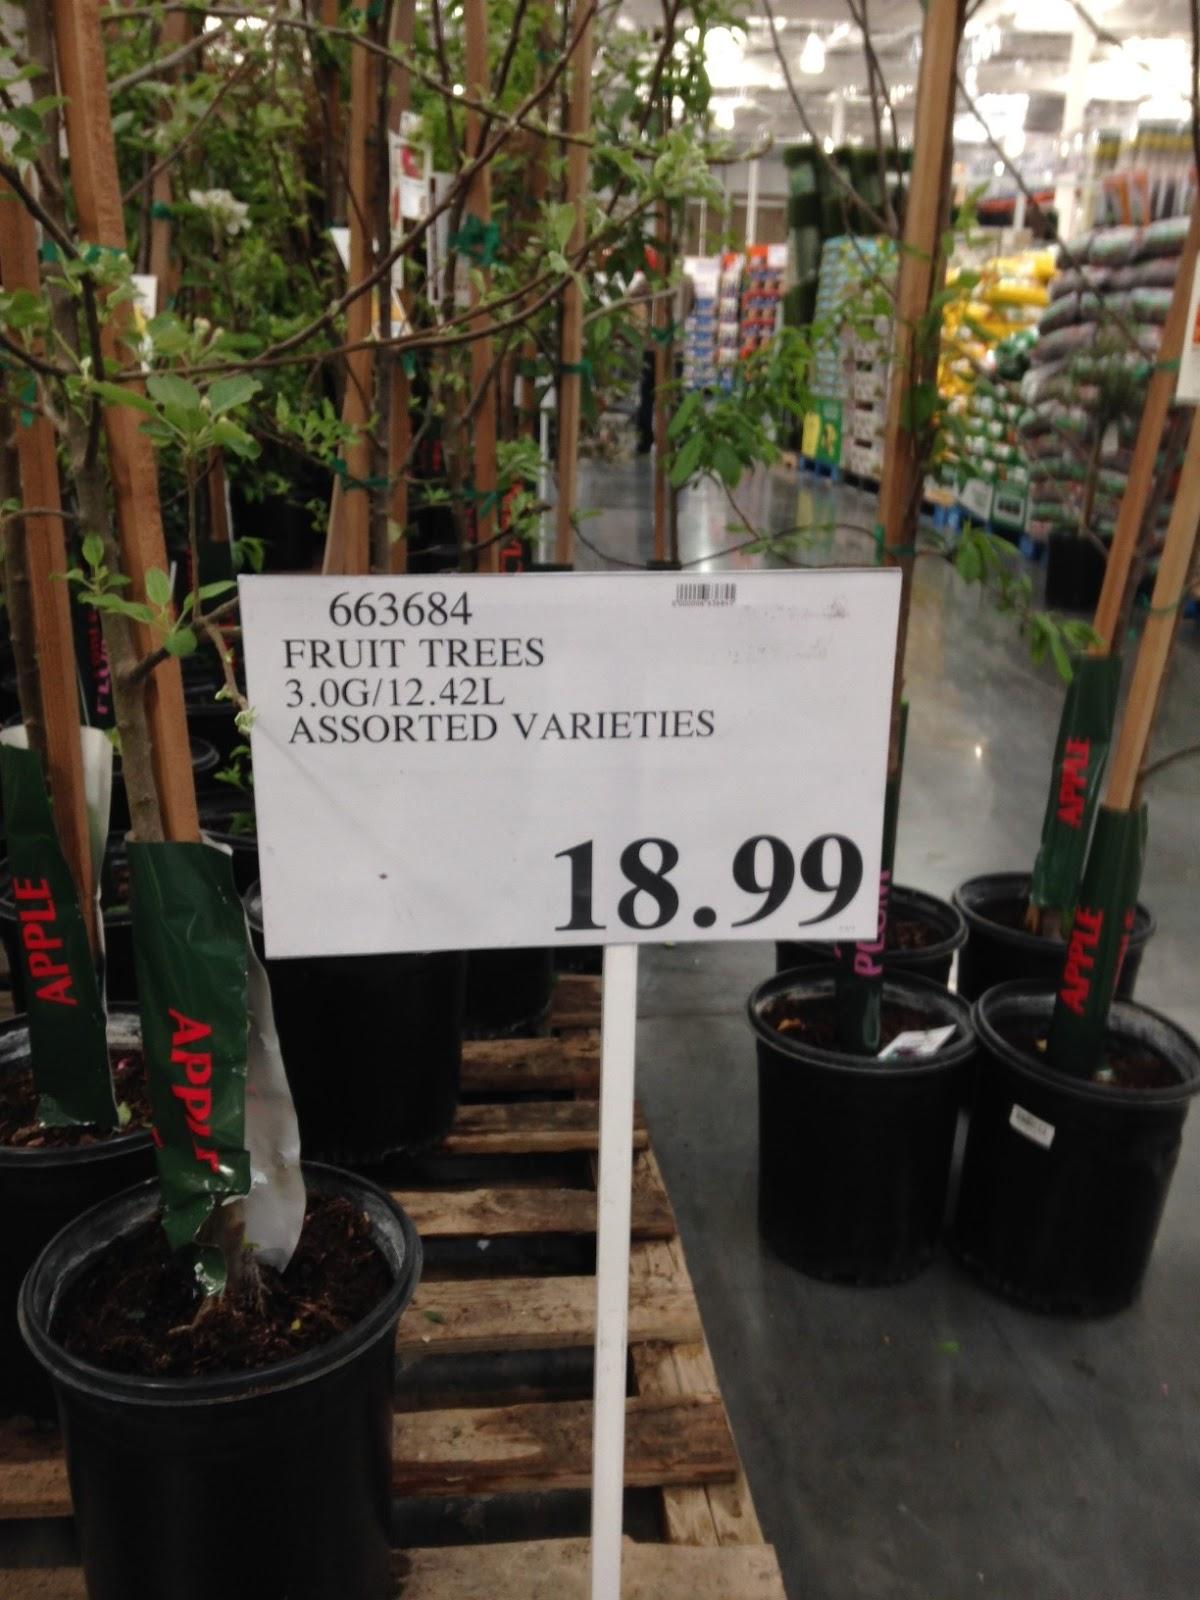 Assorted Fruit Trees 3 Gallon Assorted Varieties Plum And Apple Costco Weekender